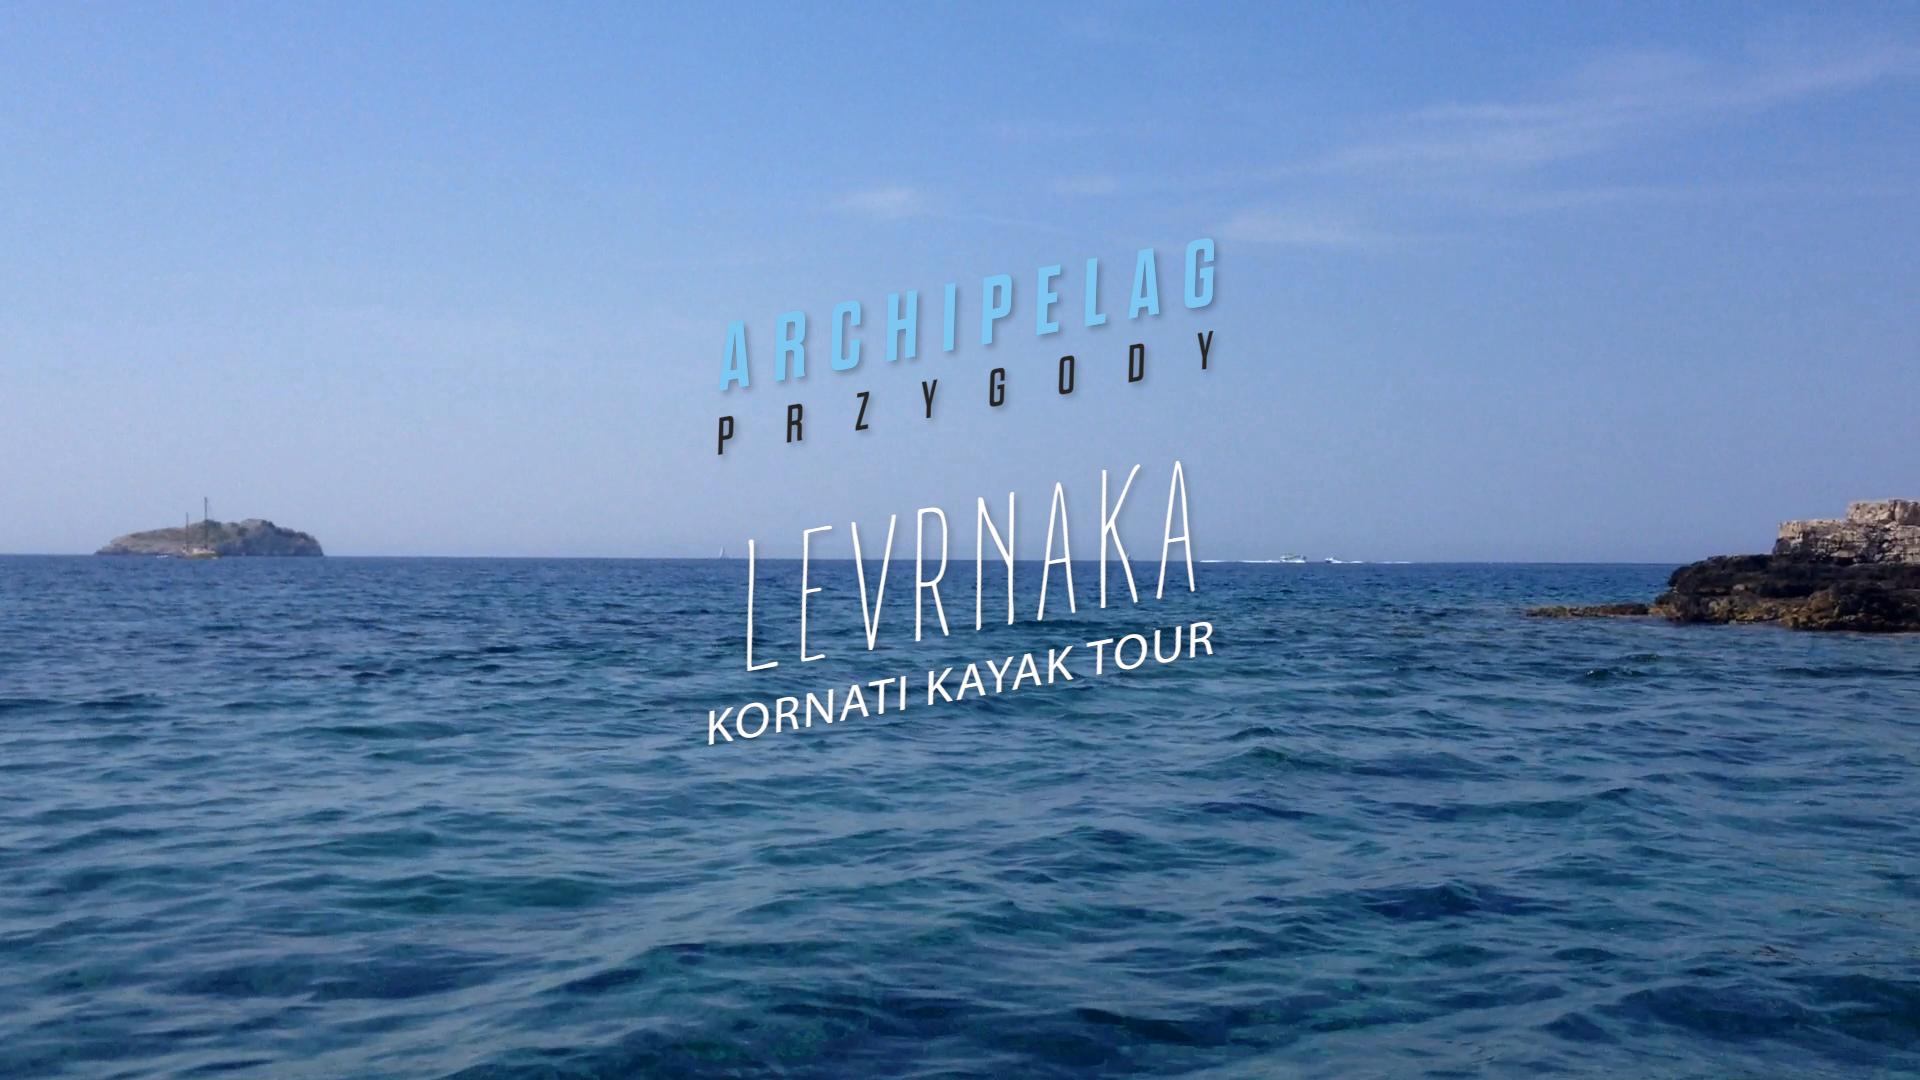 KORNATI KAYAK TOUR – Levrnaka (Film)